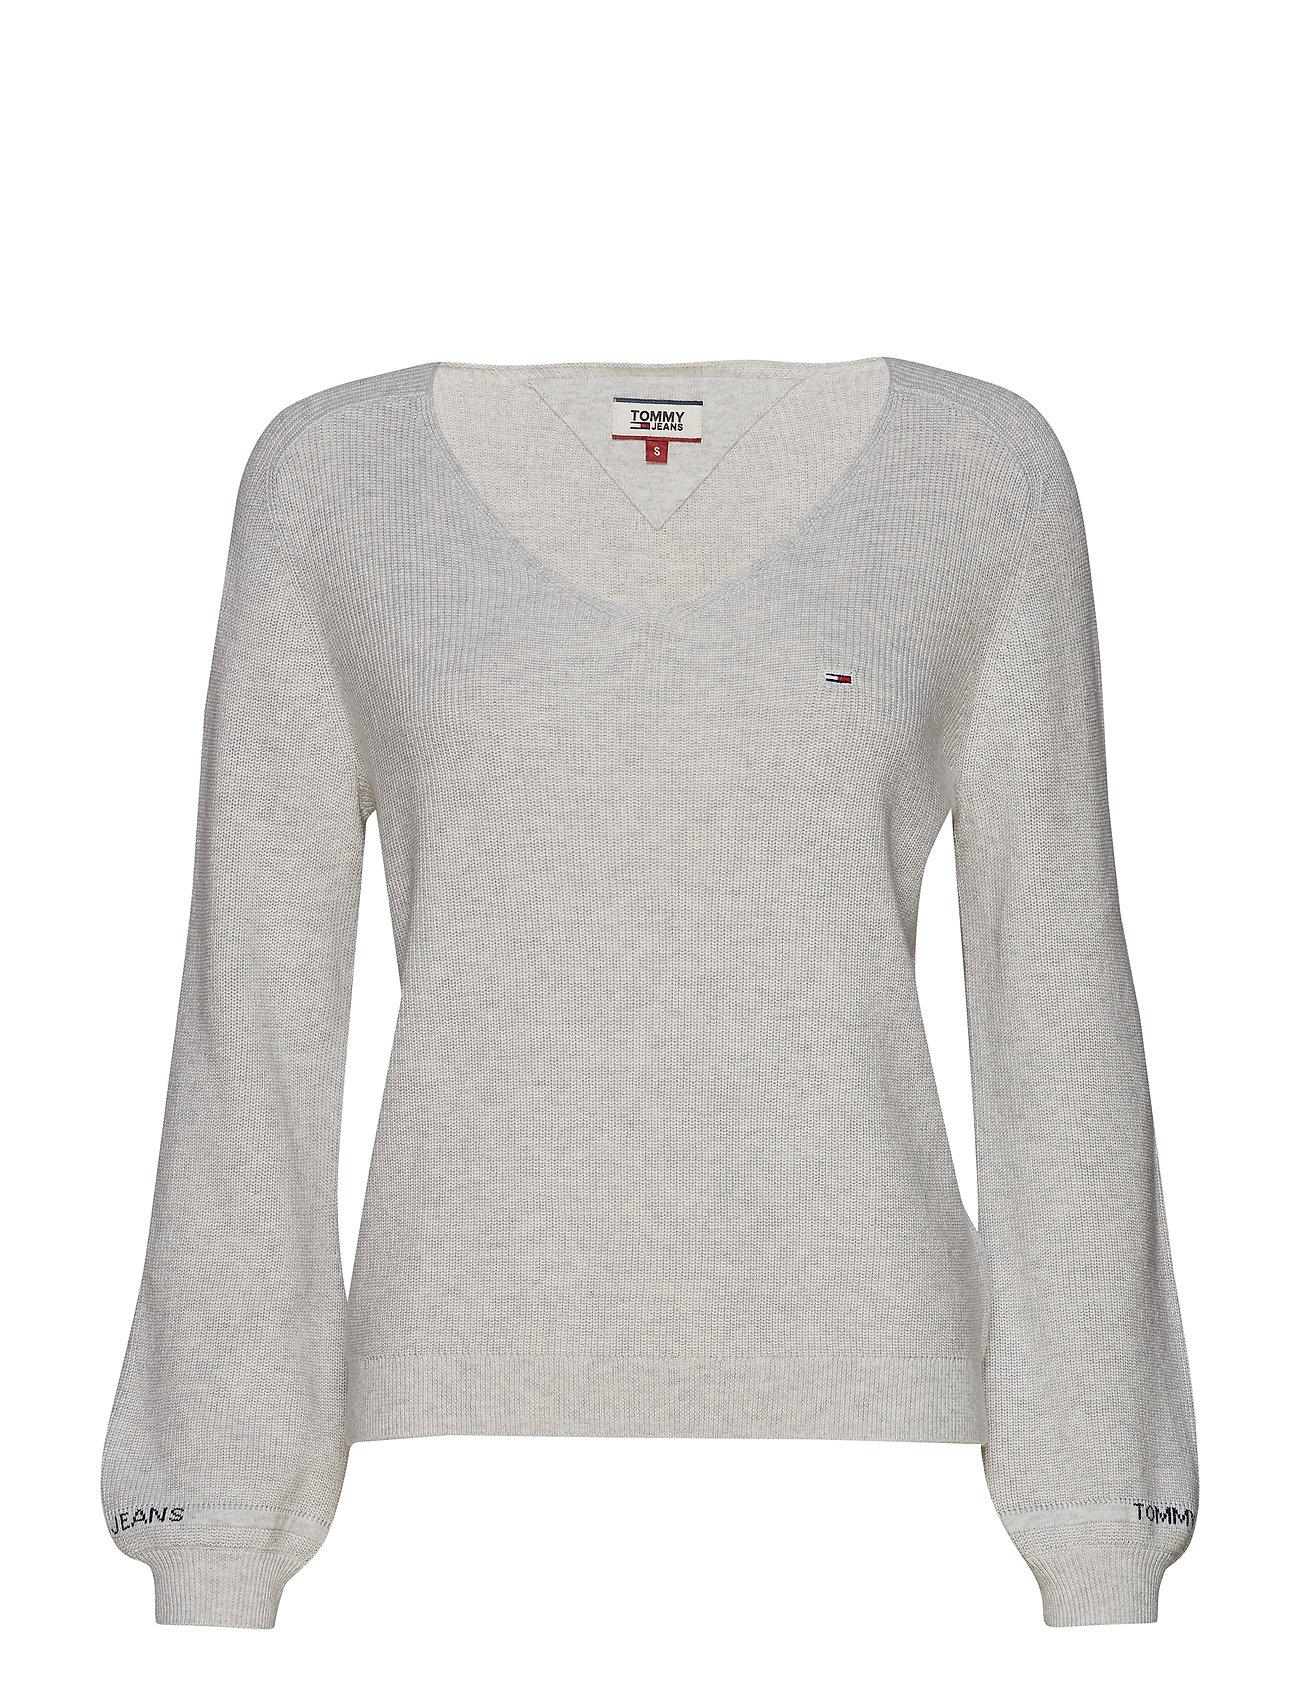 Swpale Sleeve Tjw Detail Grey HeatherTommy Jeans zMVpGqSU